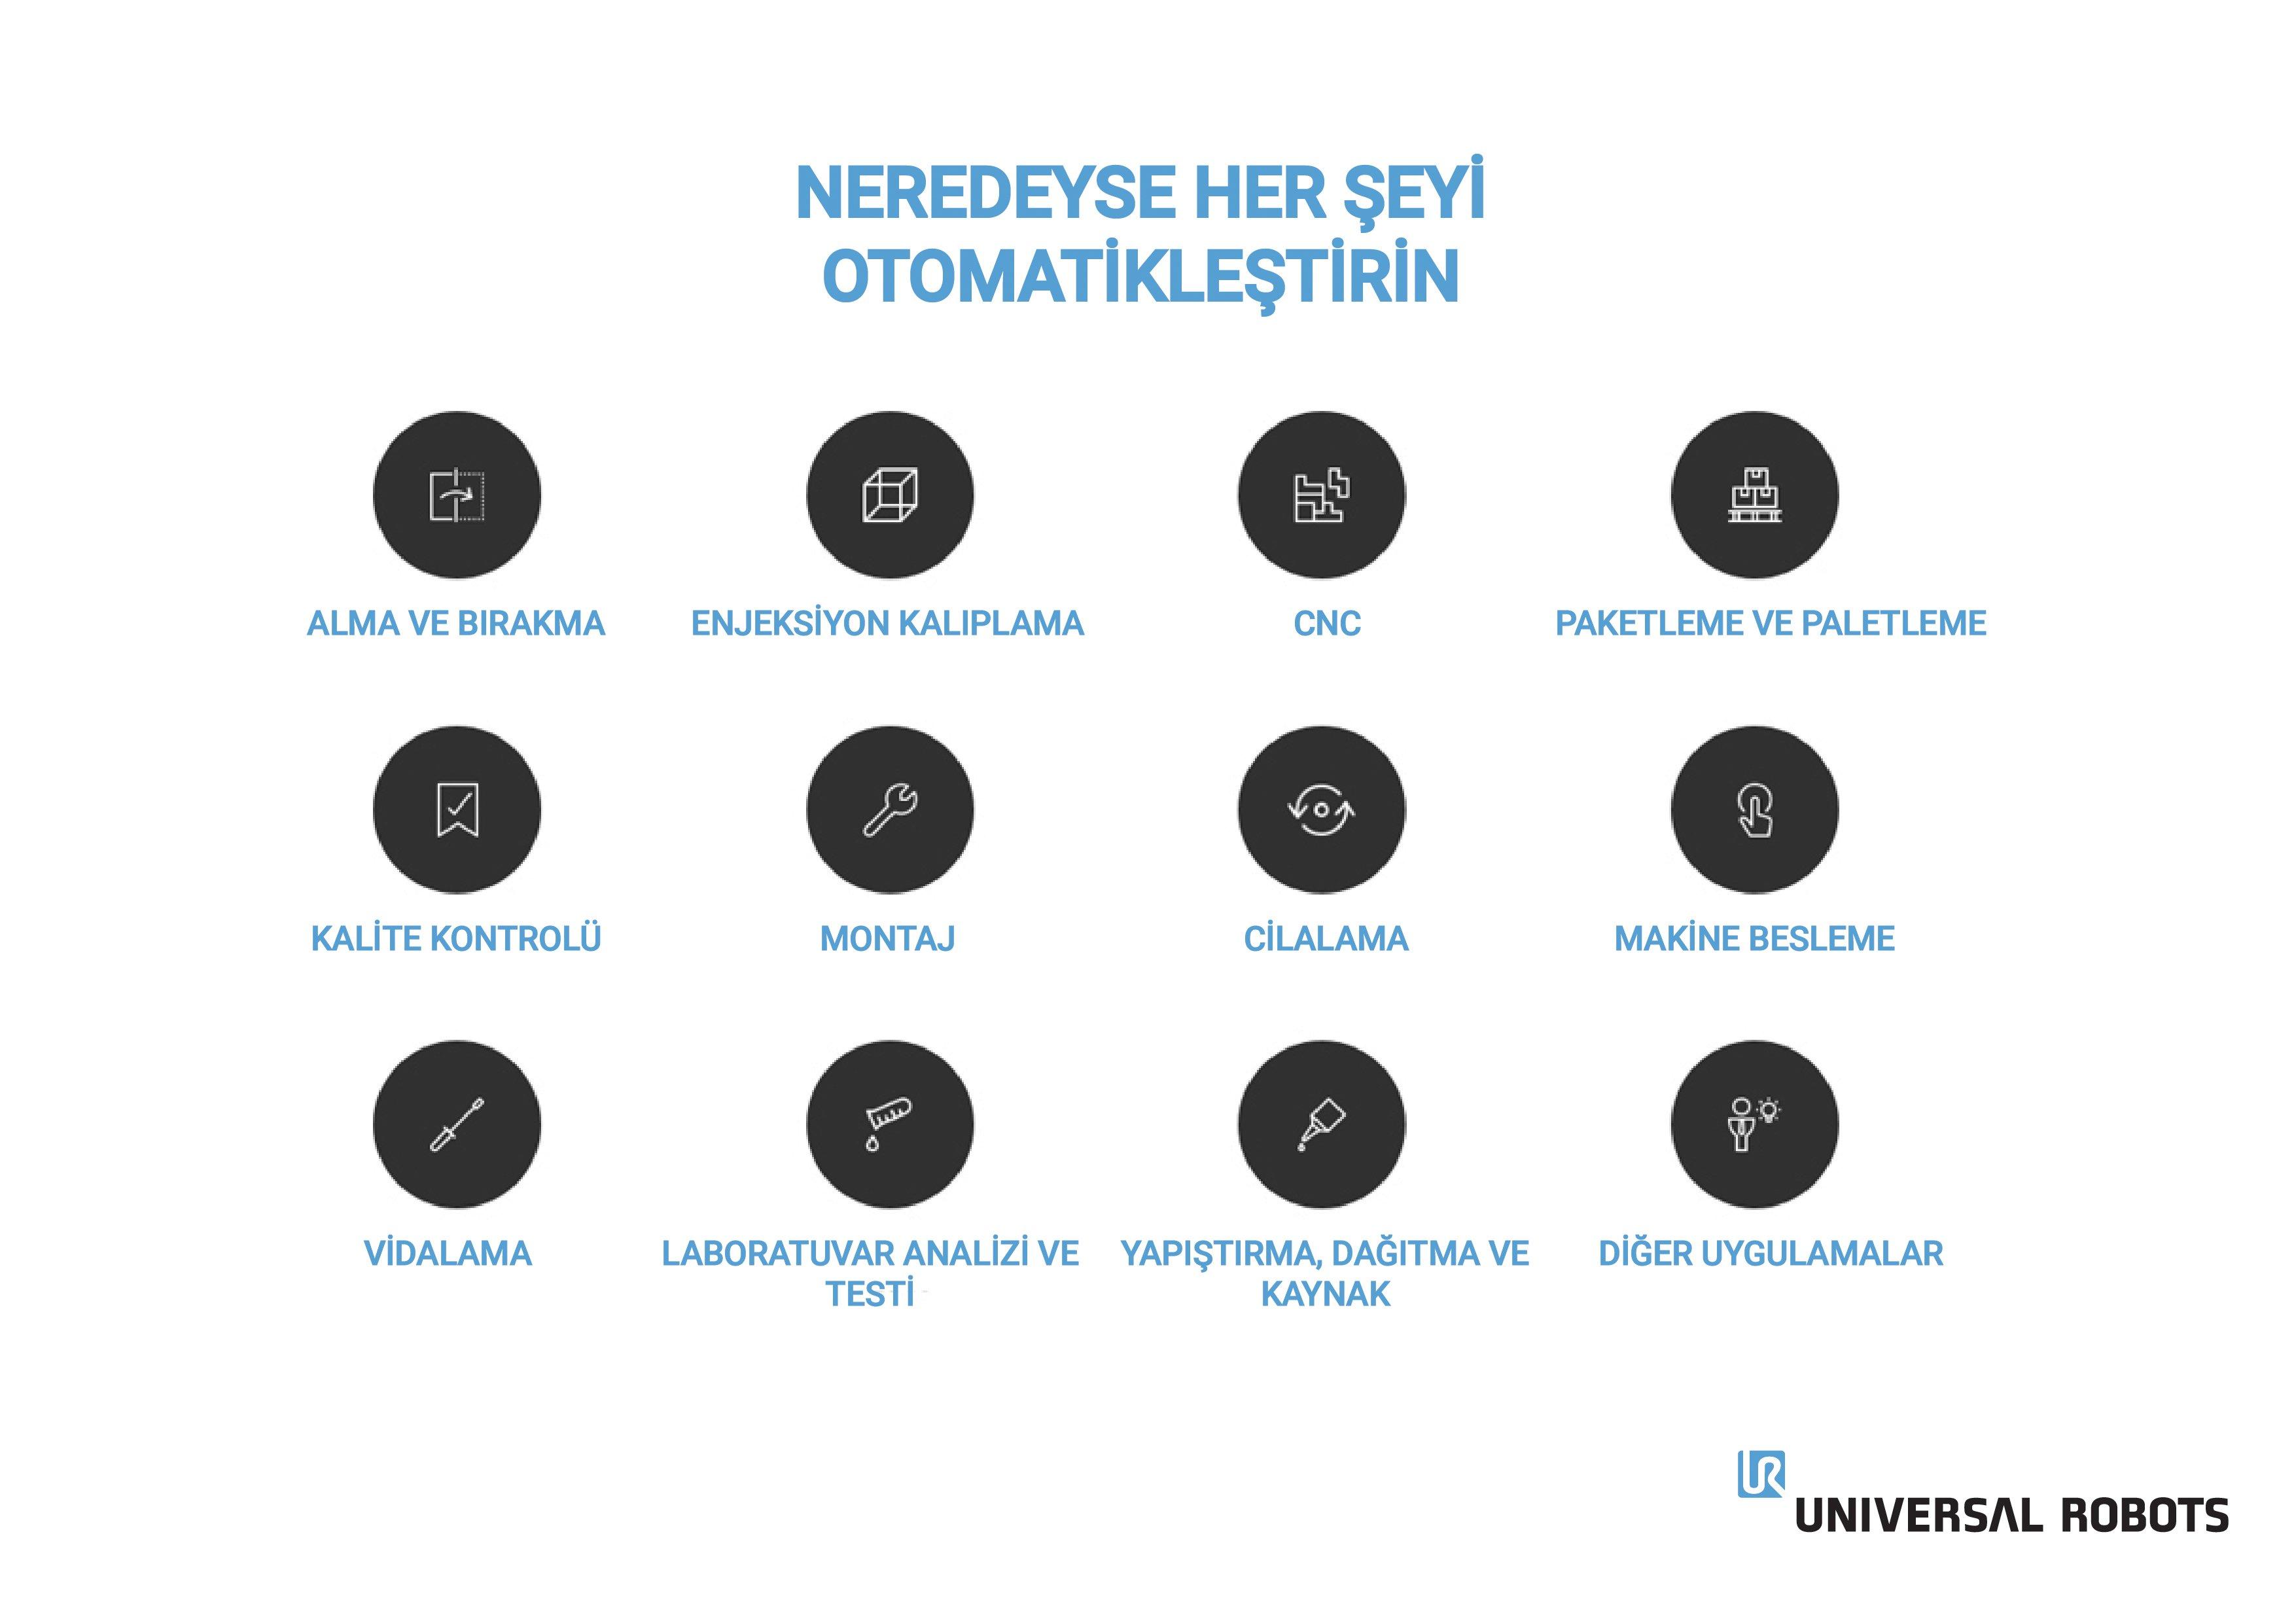 UR_linkedin_paylasim